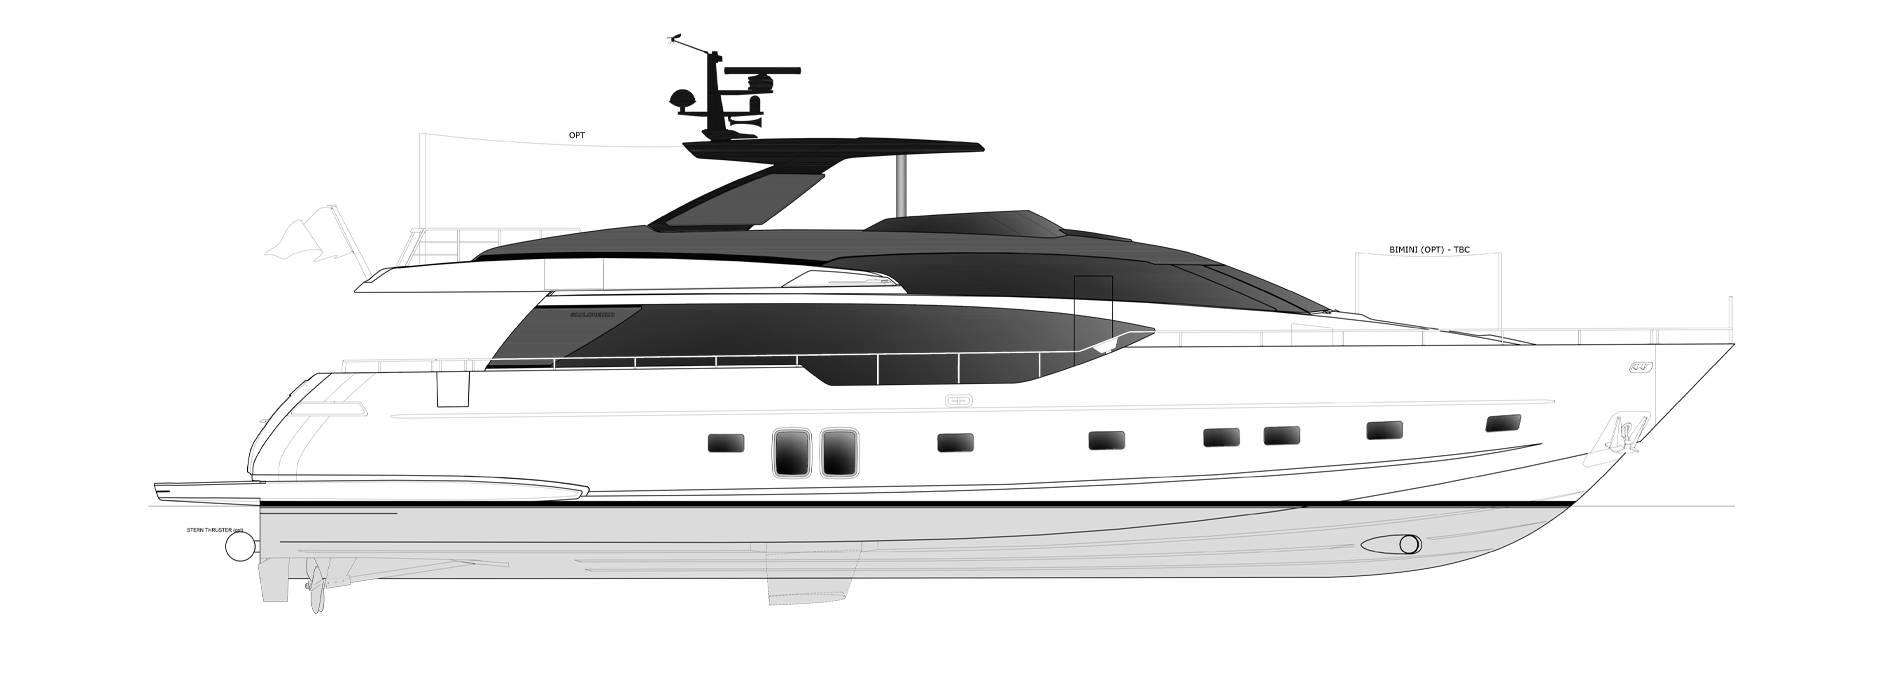 Sanlorenzo Yachts SL86-727 Profil